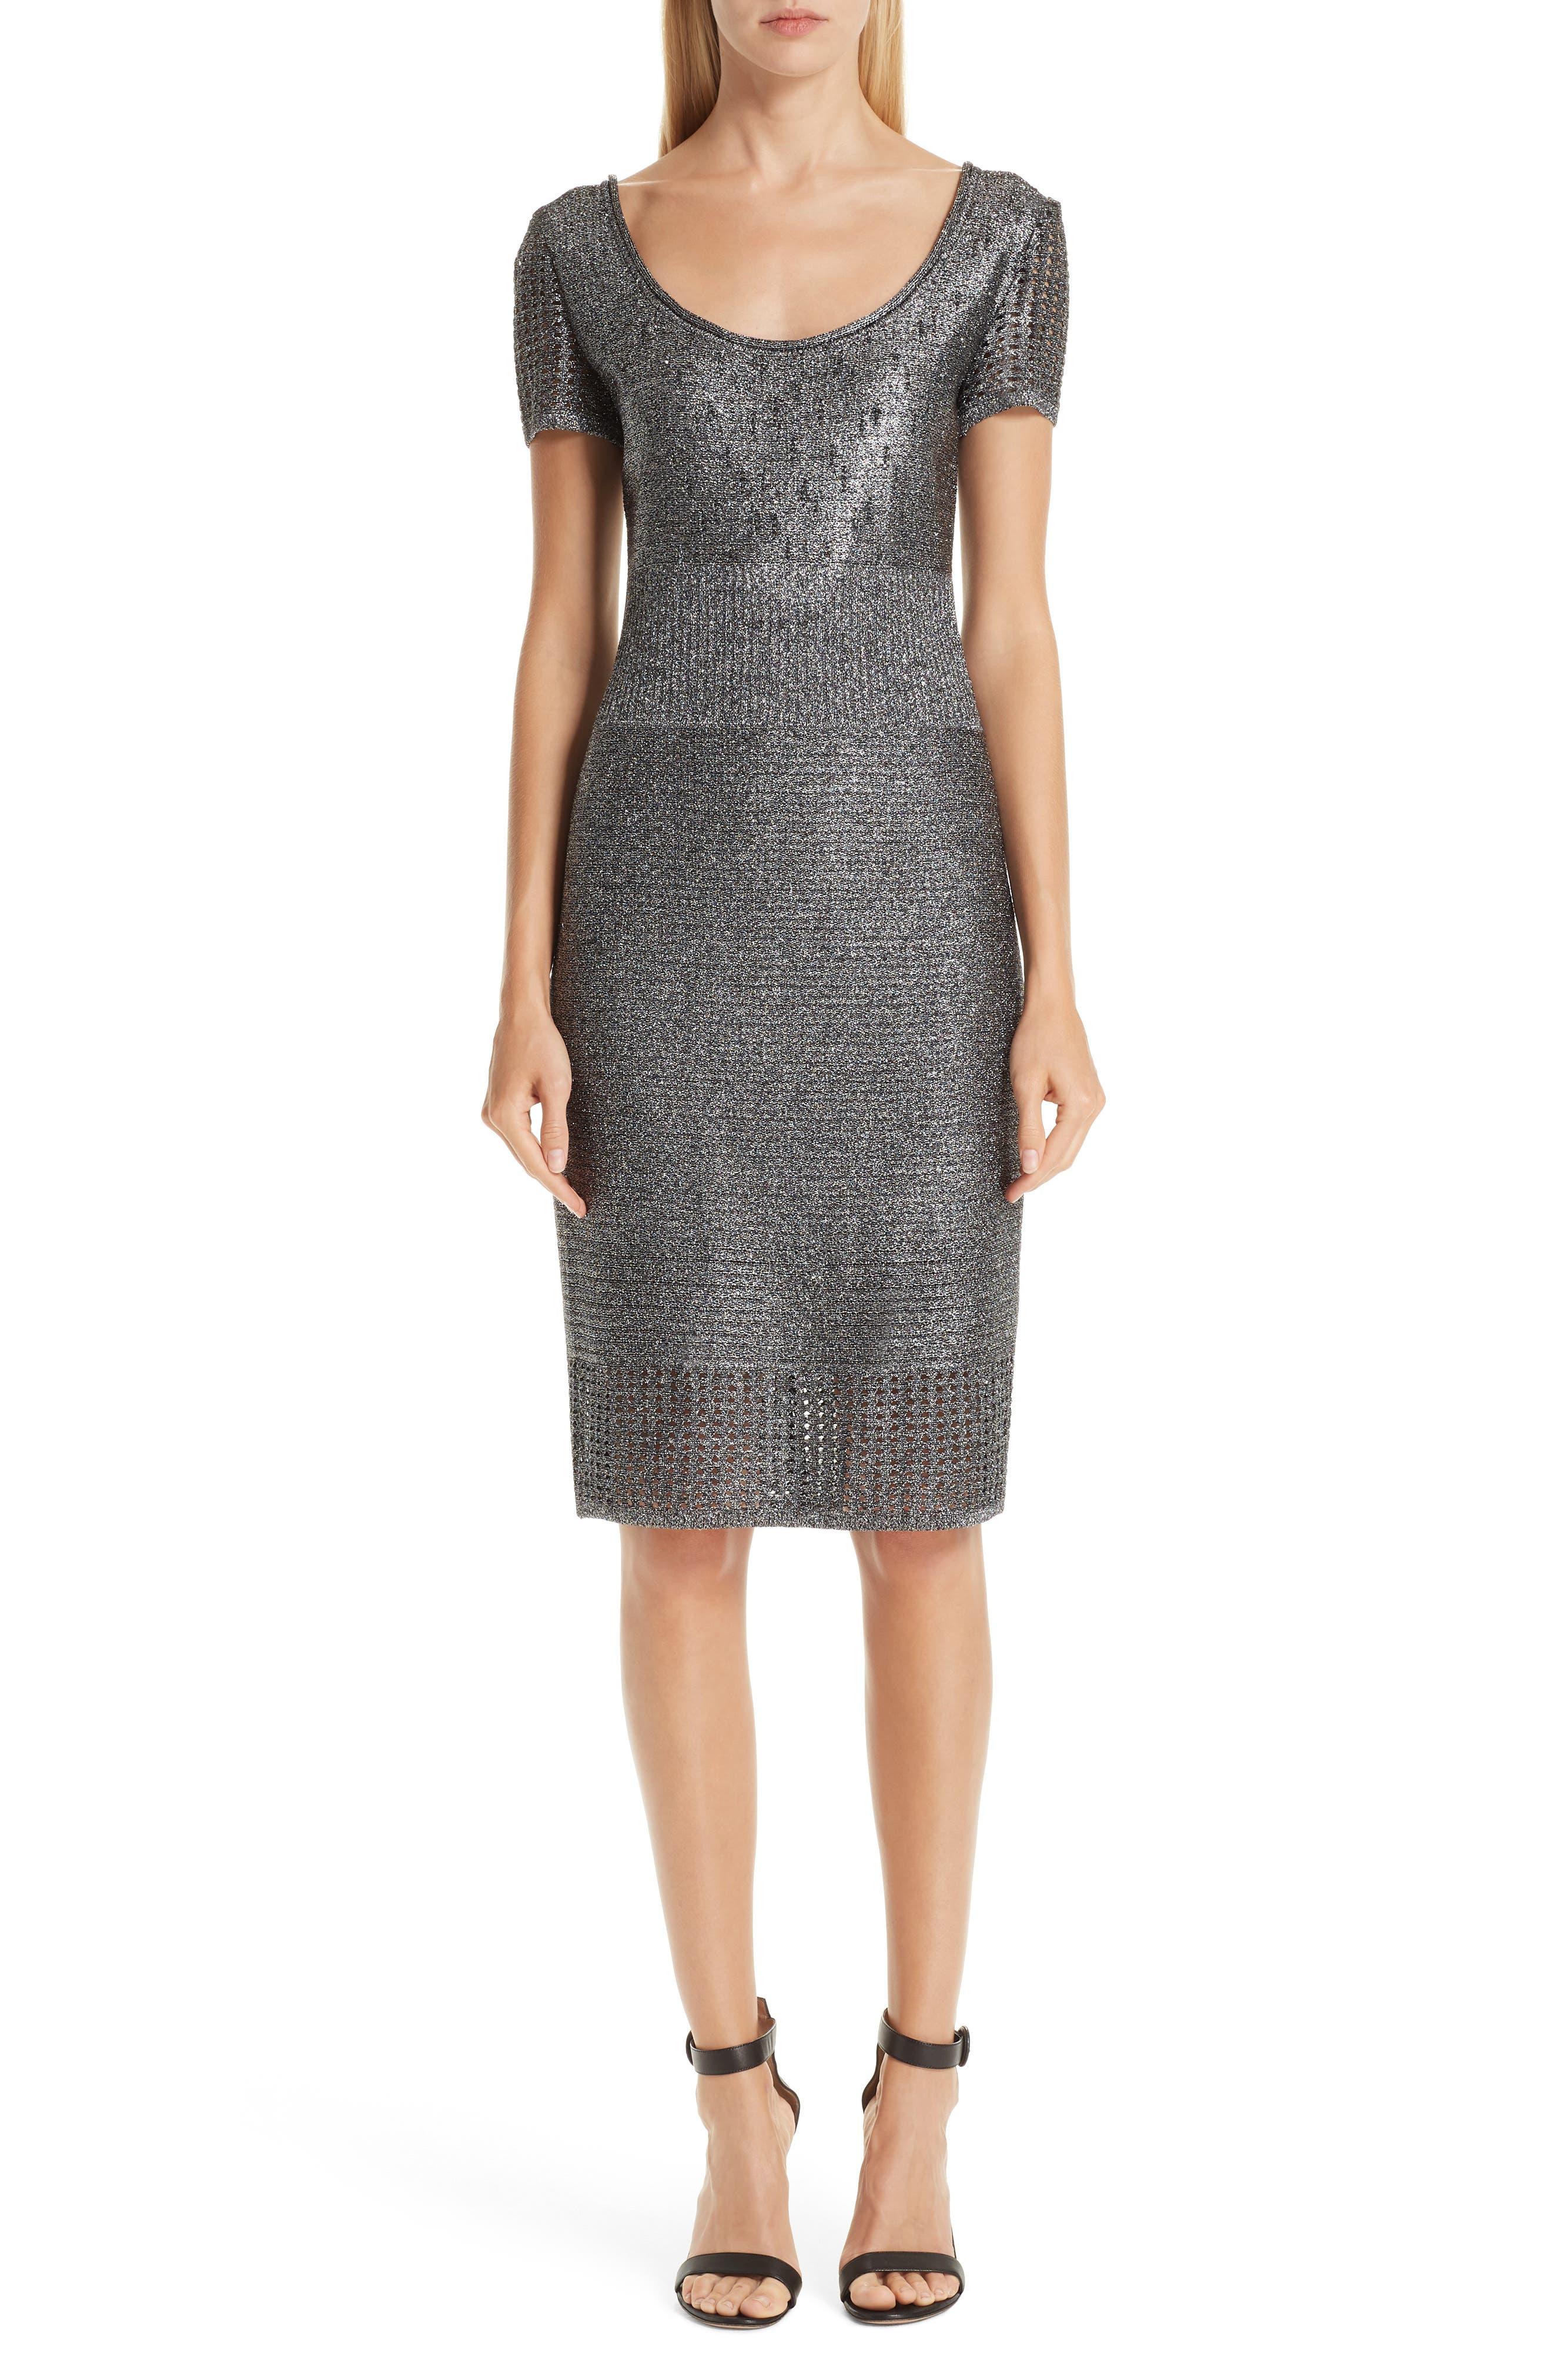 ST. JOHN COLLECTION, Metallic Plaited Mixed Knit Dress, Main thumbnail 1, color, GUNMETAL/ CAVIAR